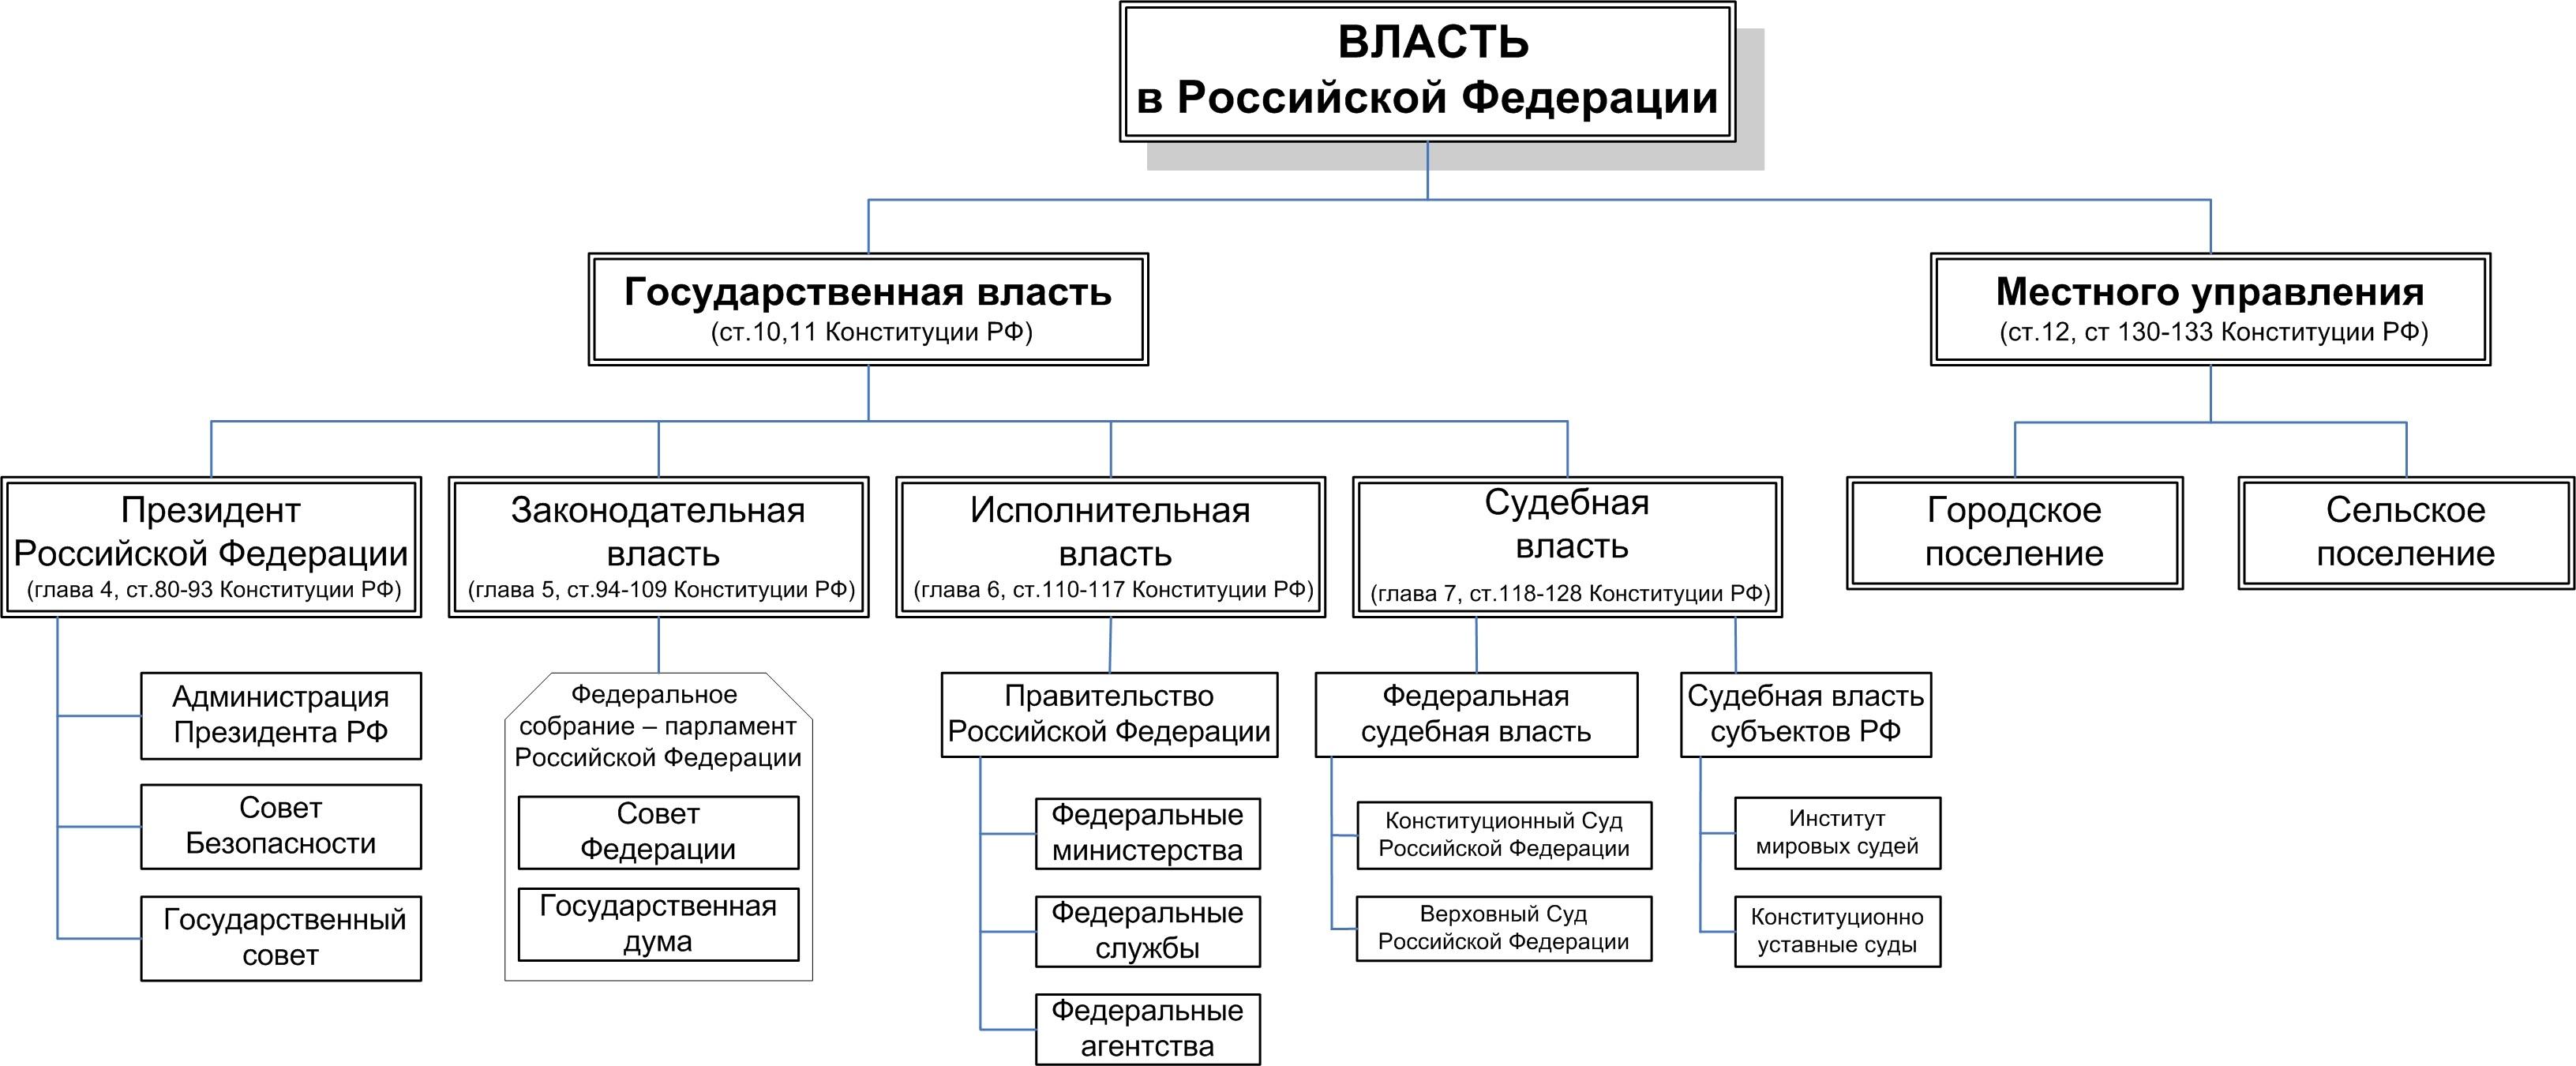 ВЛАСТЬ2_(схема)